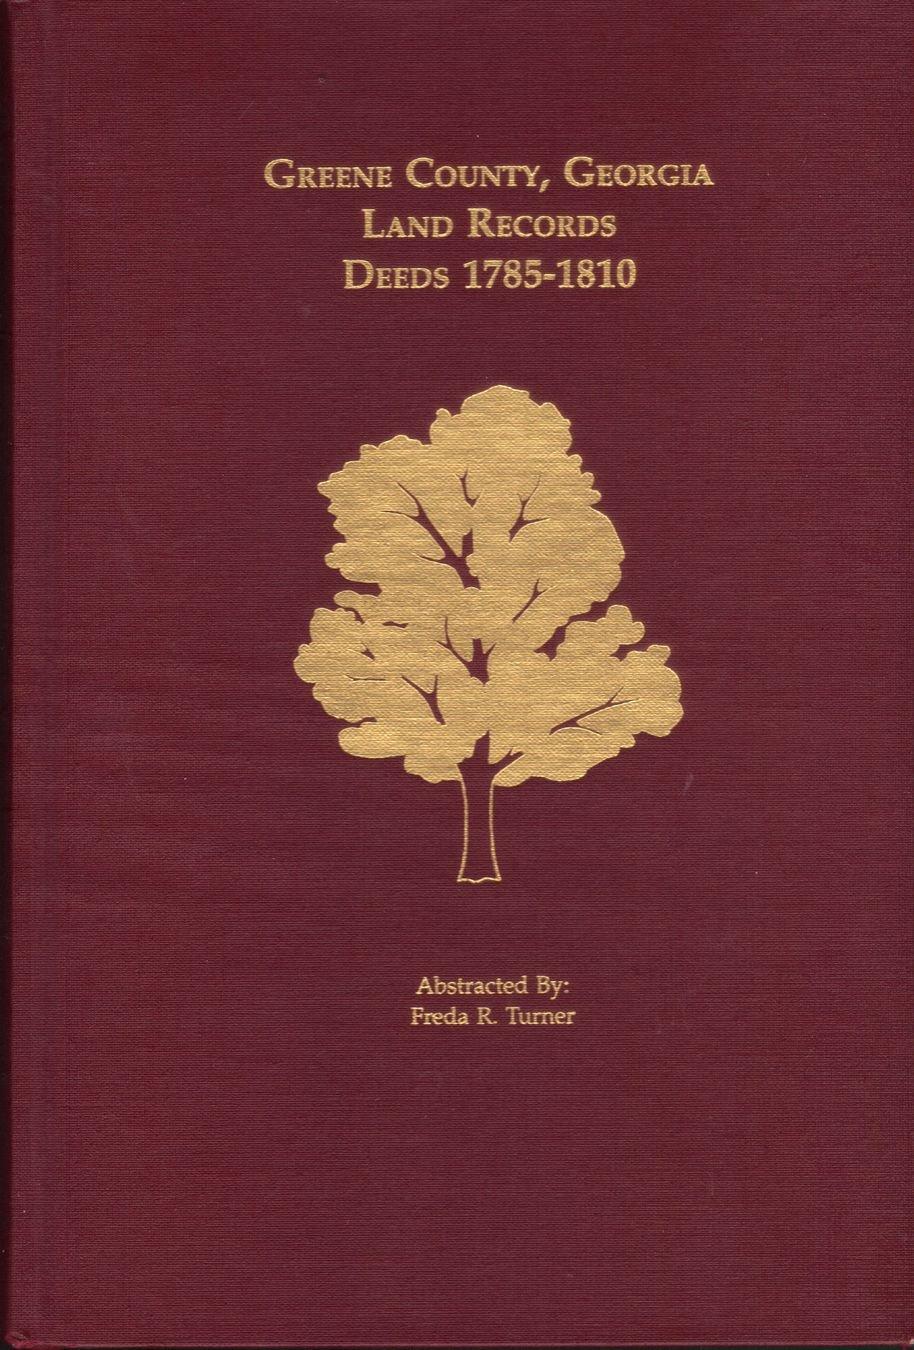 Greene County, Georgia Land Records, Deeds, 1785-1810: Freda